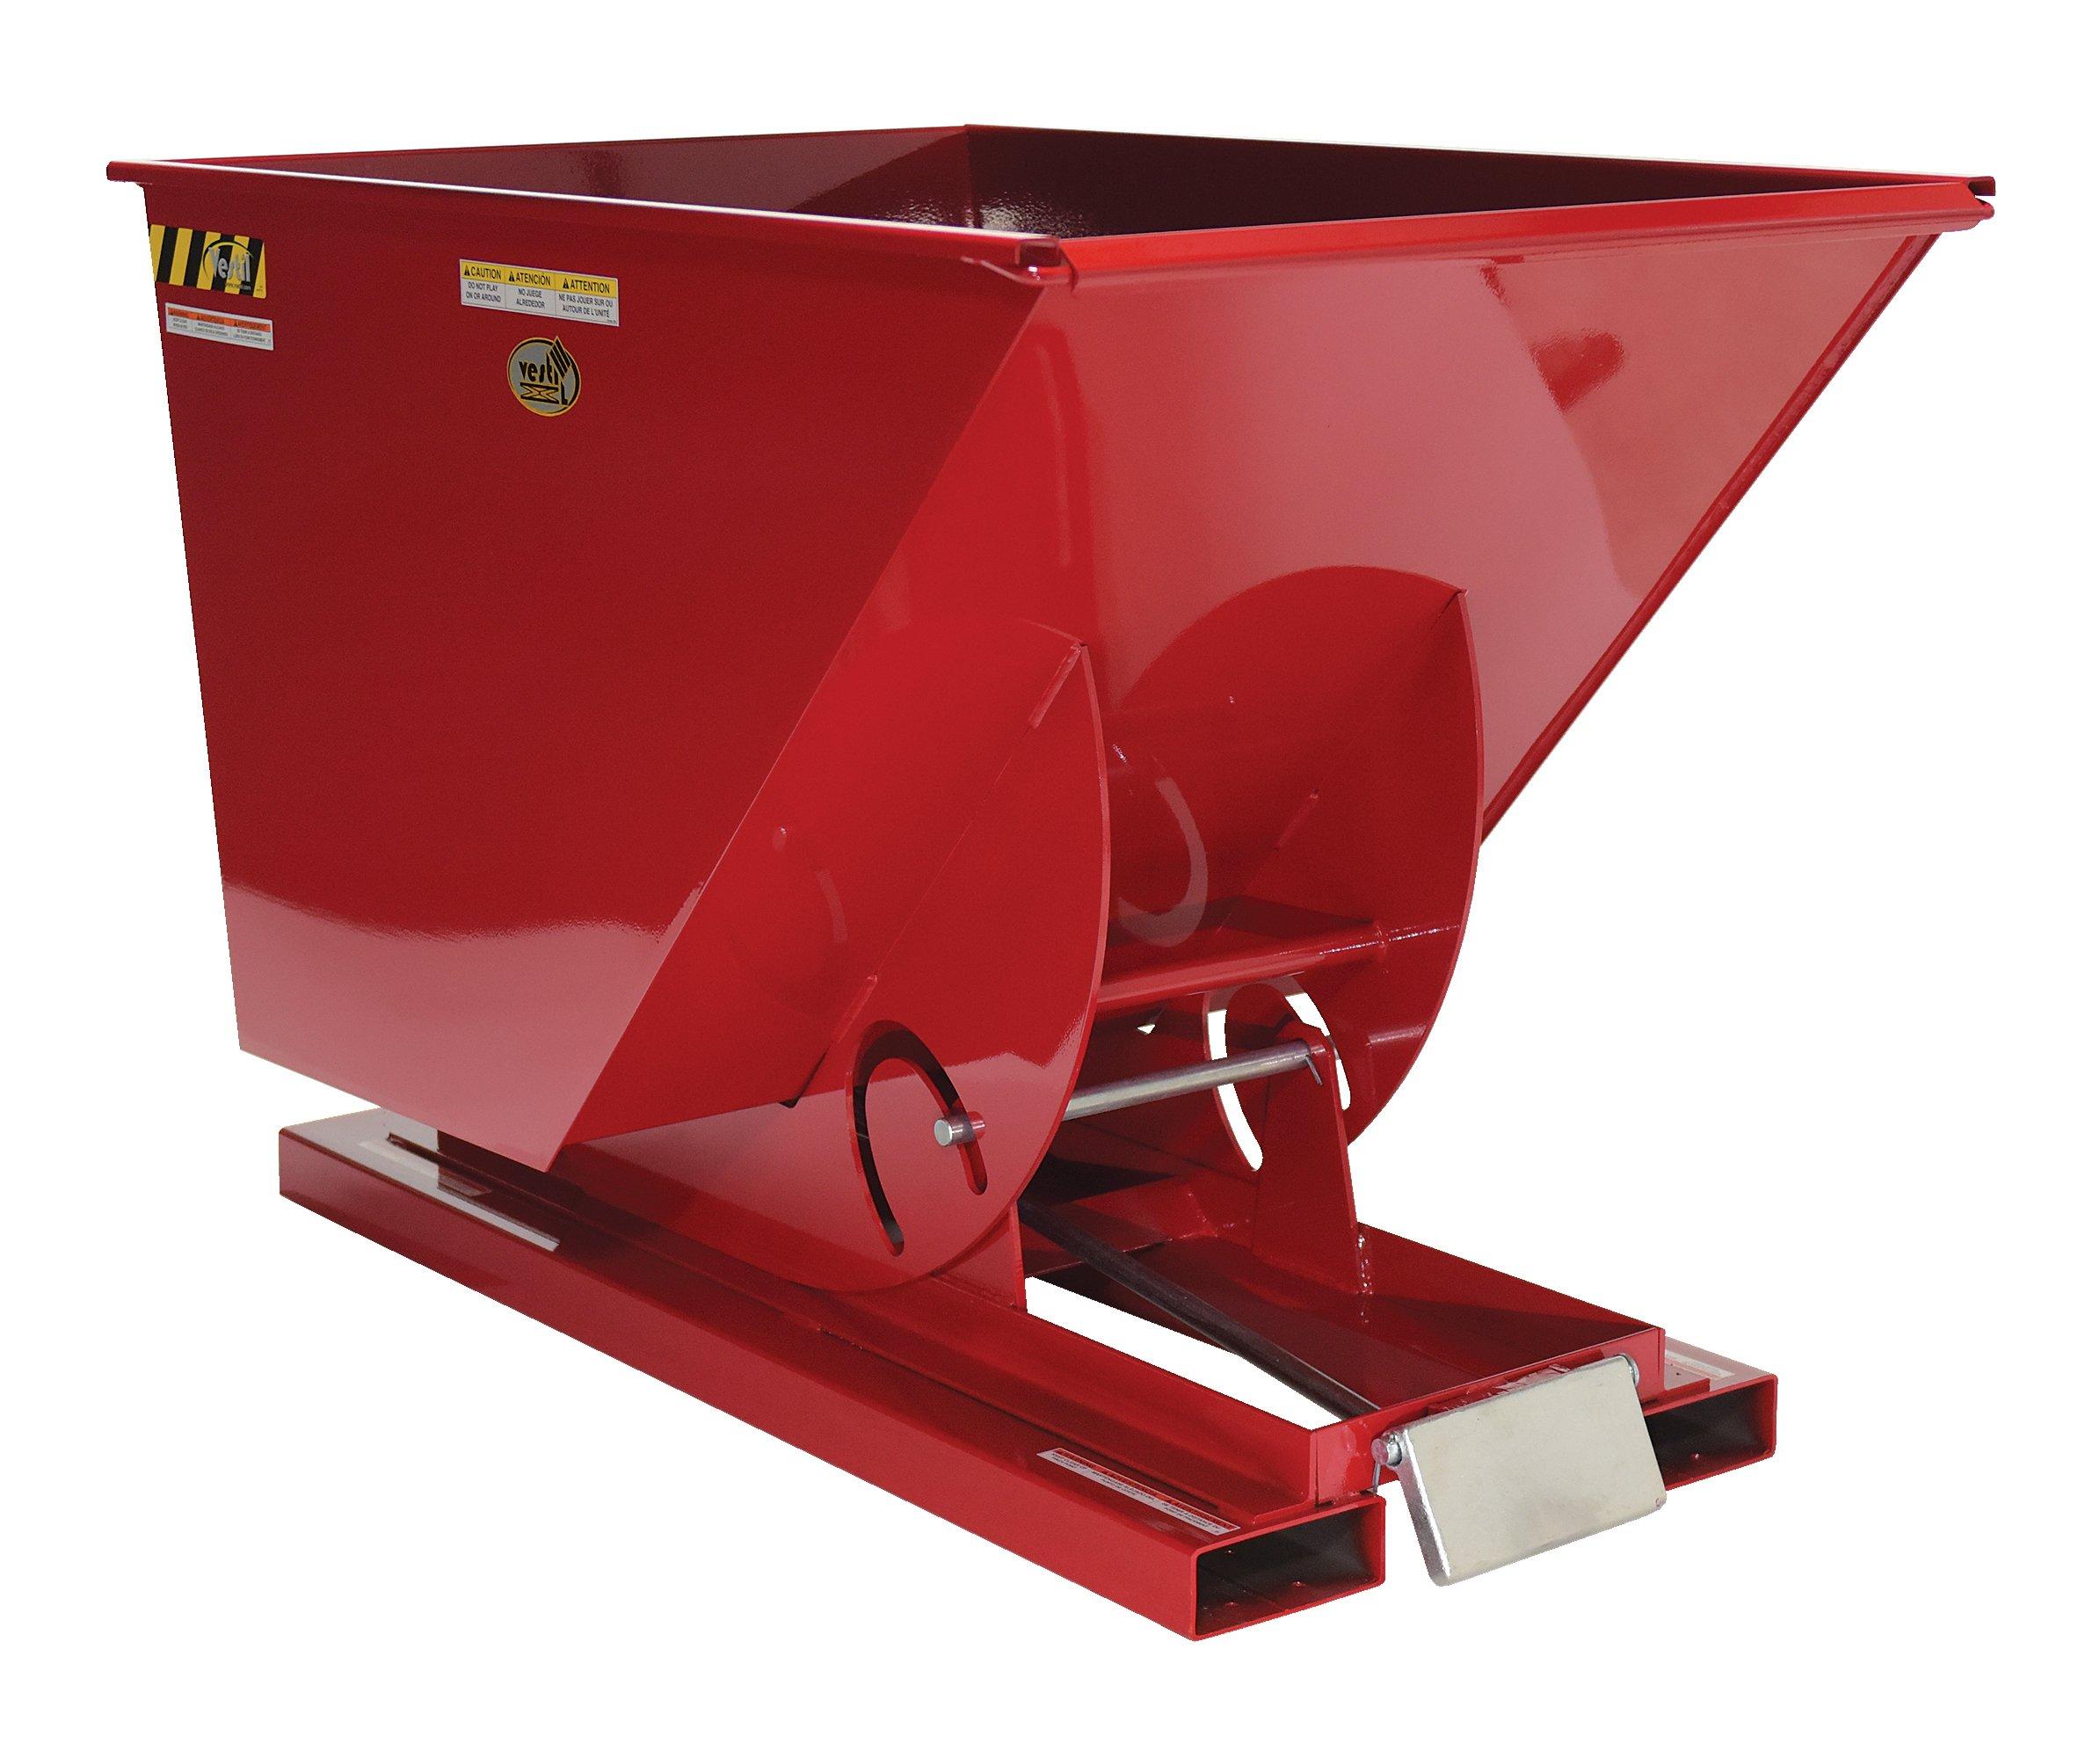 Vestil D-25-LD-SR Self-Dump LD Hopper .25 Cubic Yard, 2000 lb. Capacity, Overall L x W x H (in.) 51-7/8'' x 26'' x 38'', Red